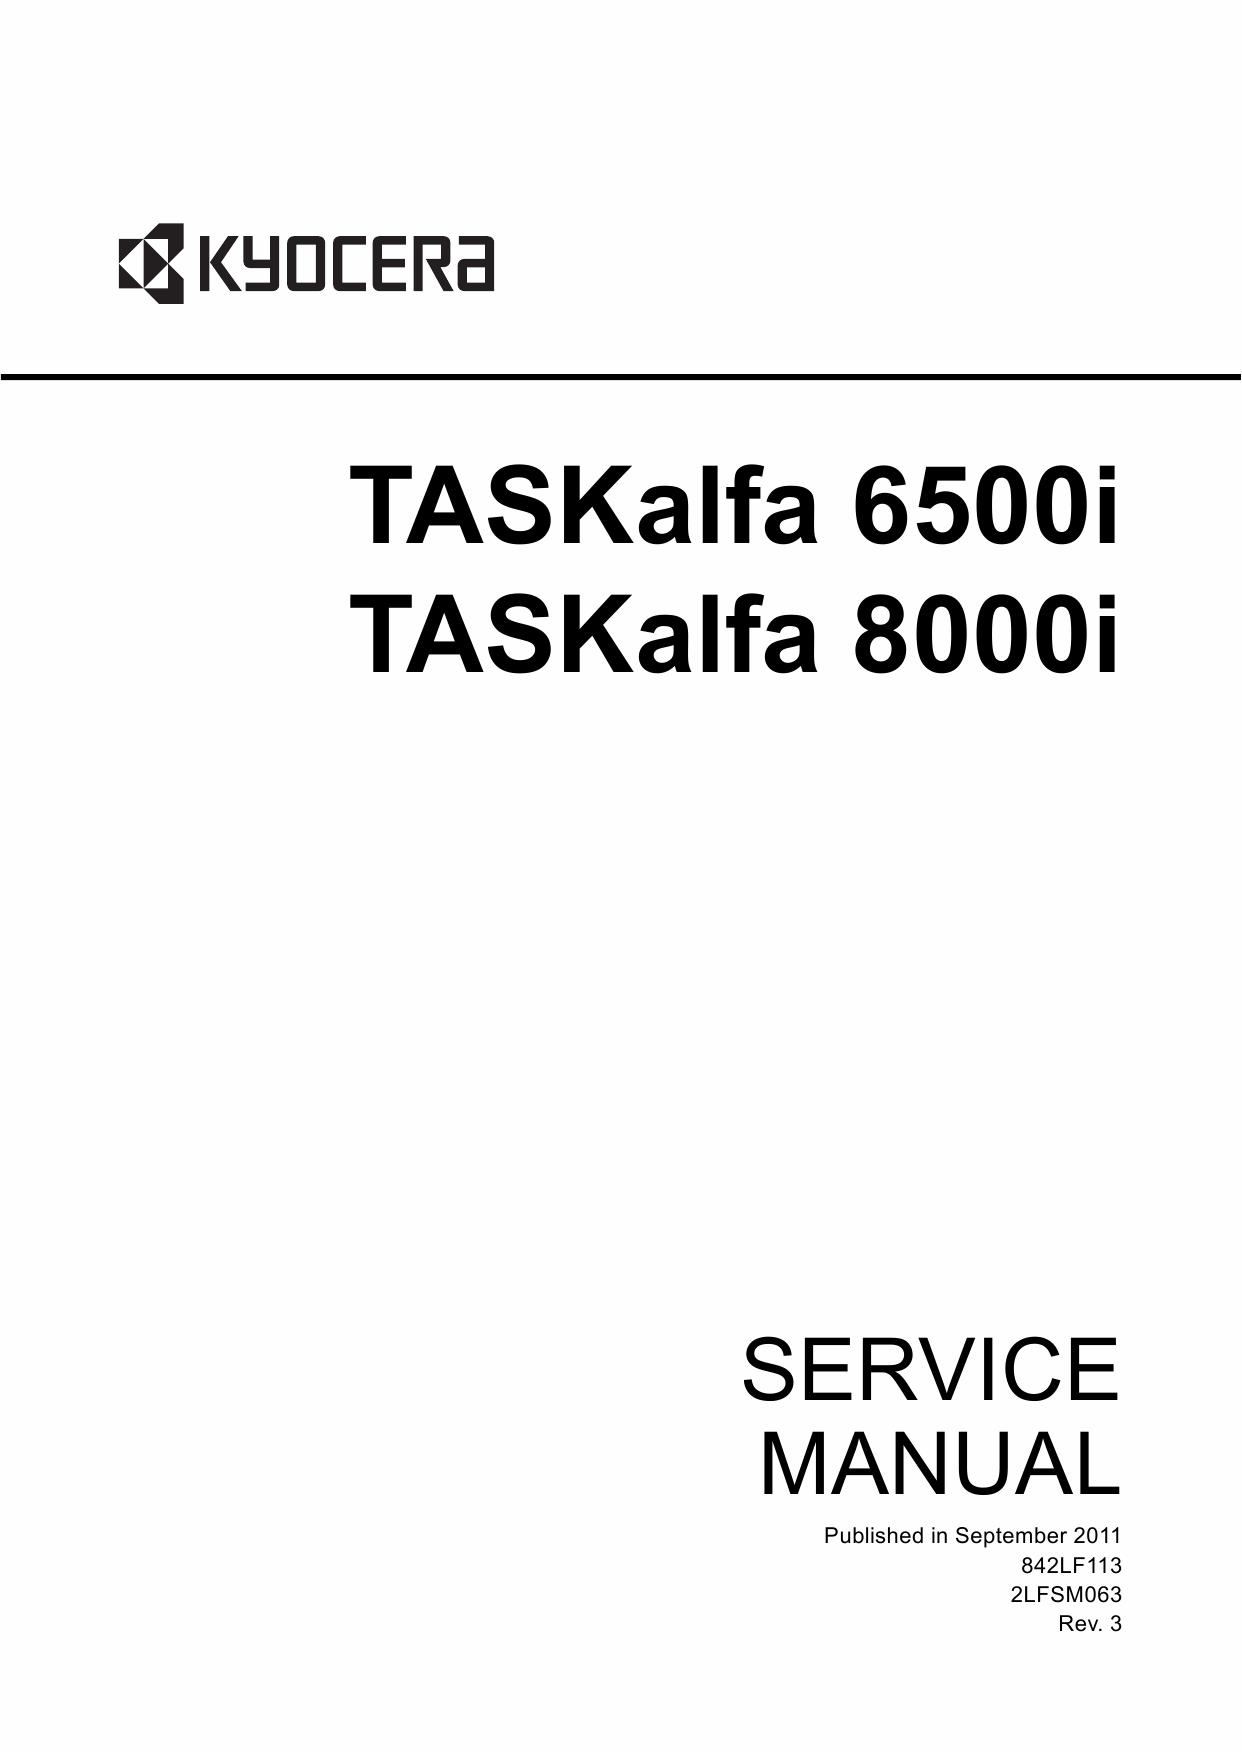 hp officejet 6500 service manual pdf